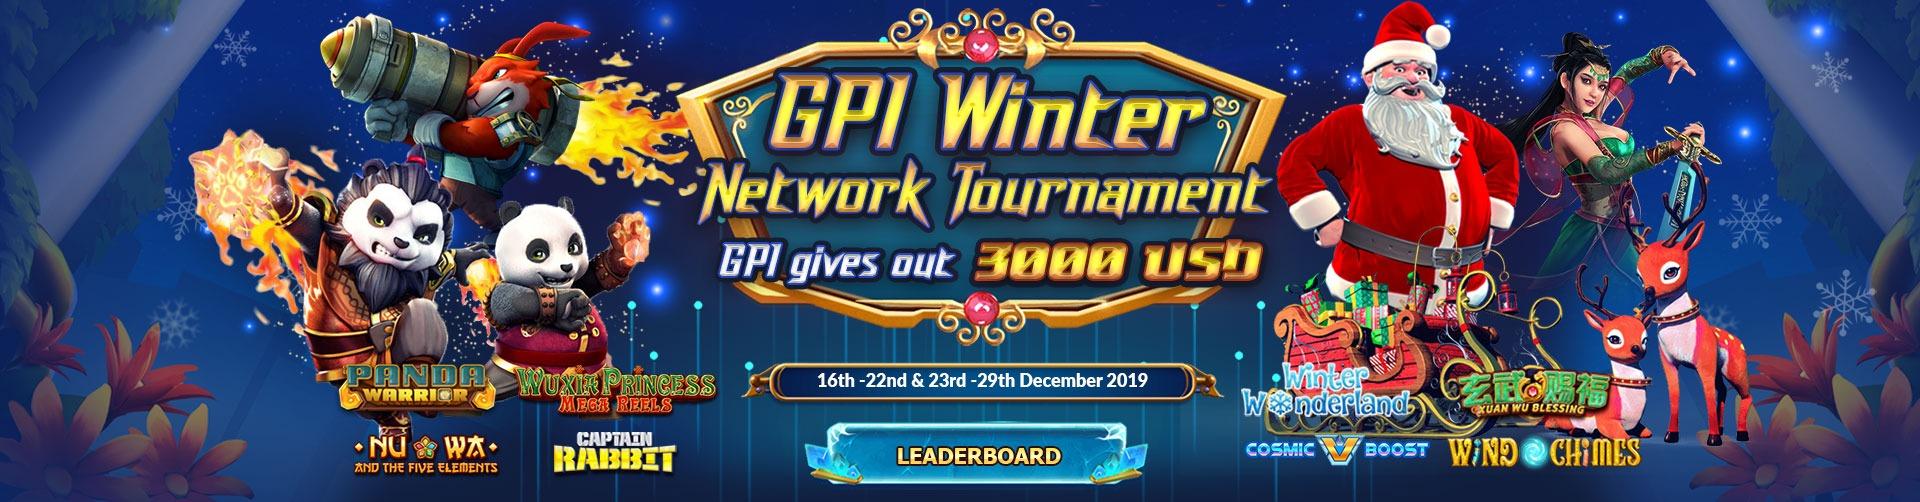 GPI Winter Network Tournament